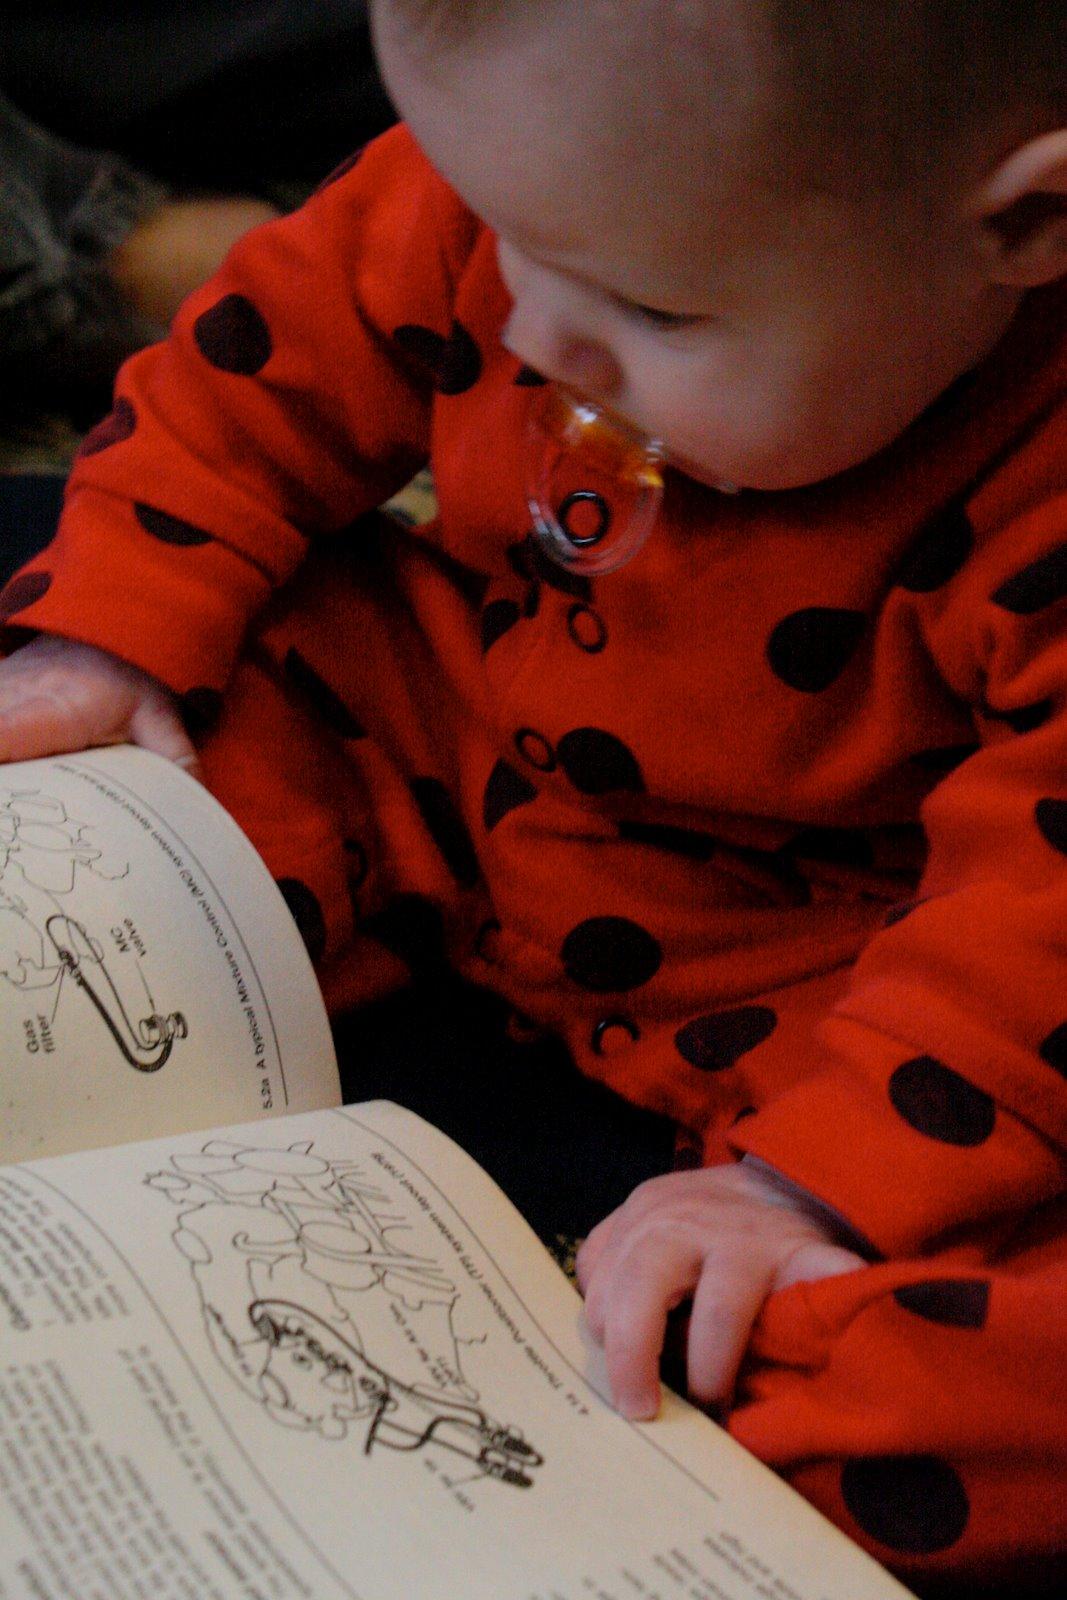 Baby reading manual